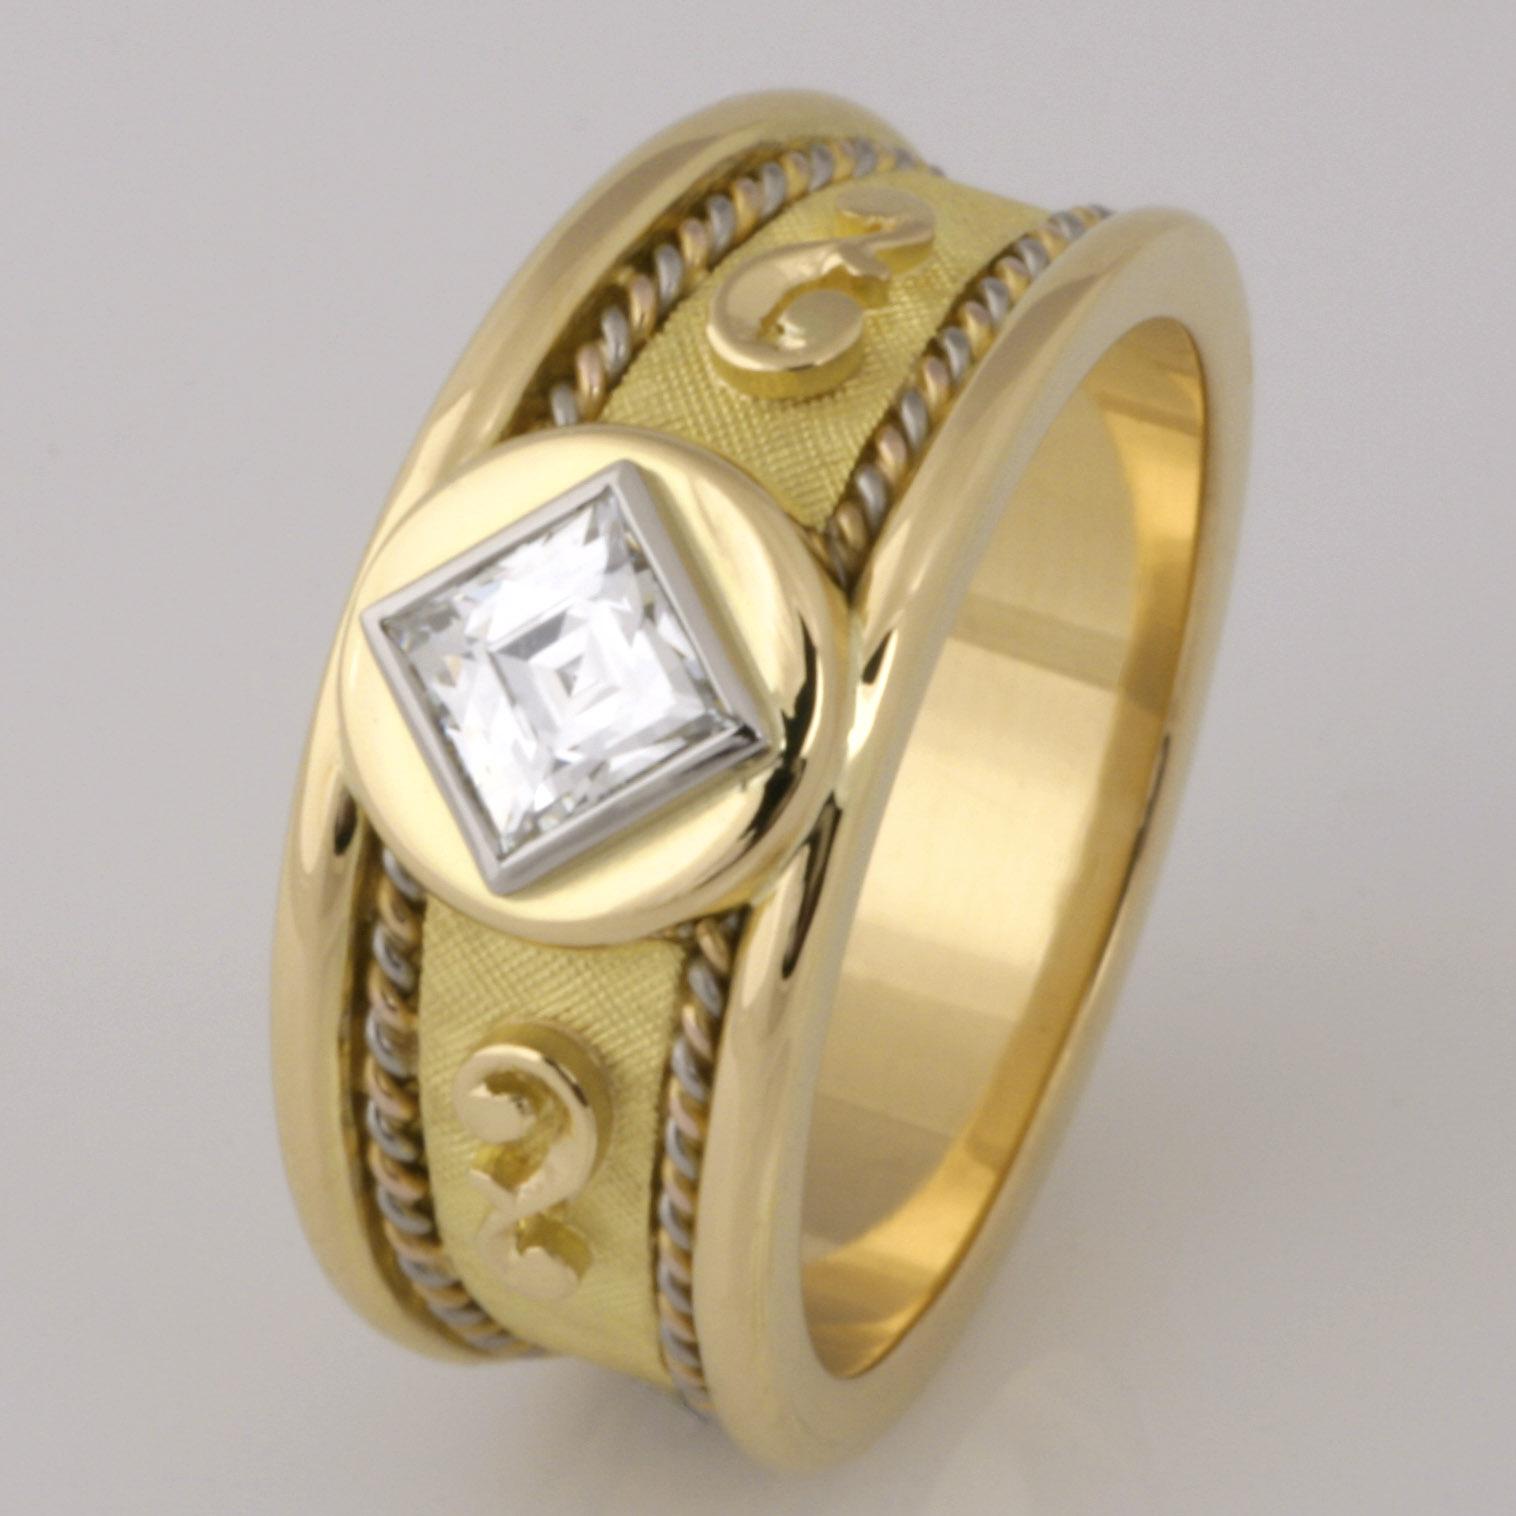 Handmade ladies 18ct yellow, rose and white gold 'Tycoon' cut diamond ring